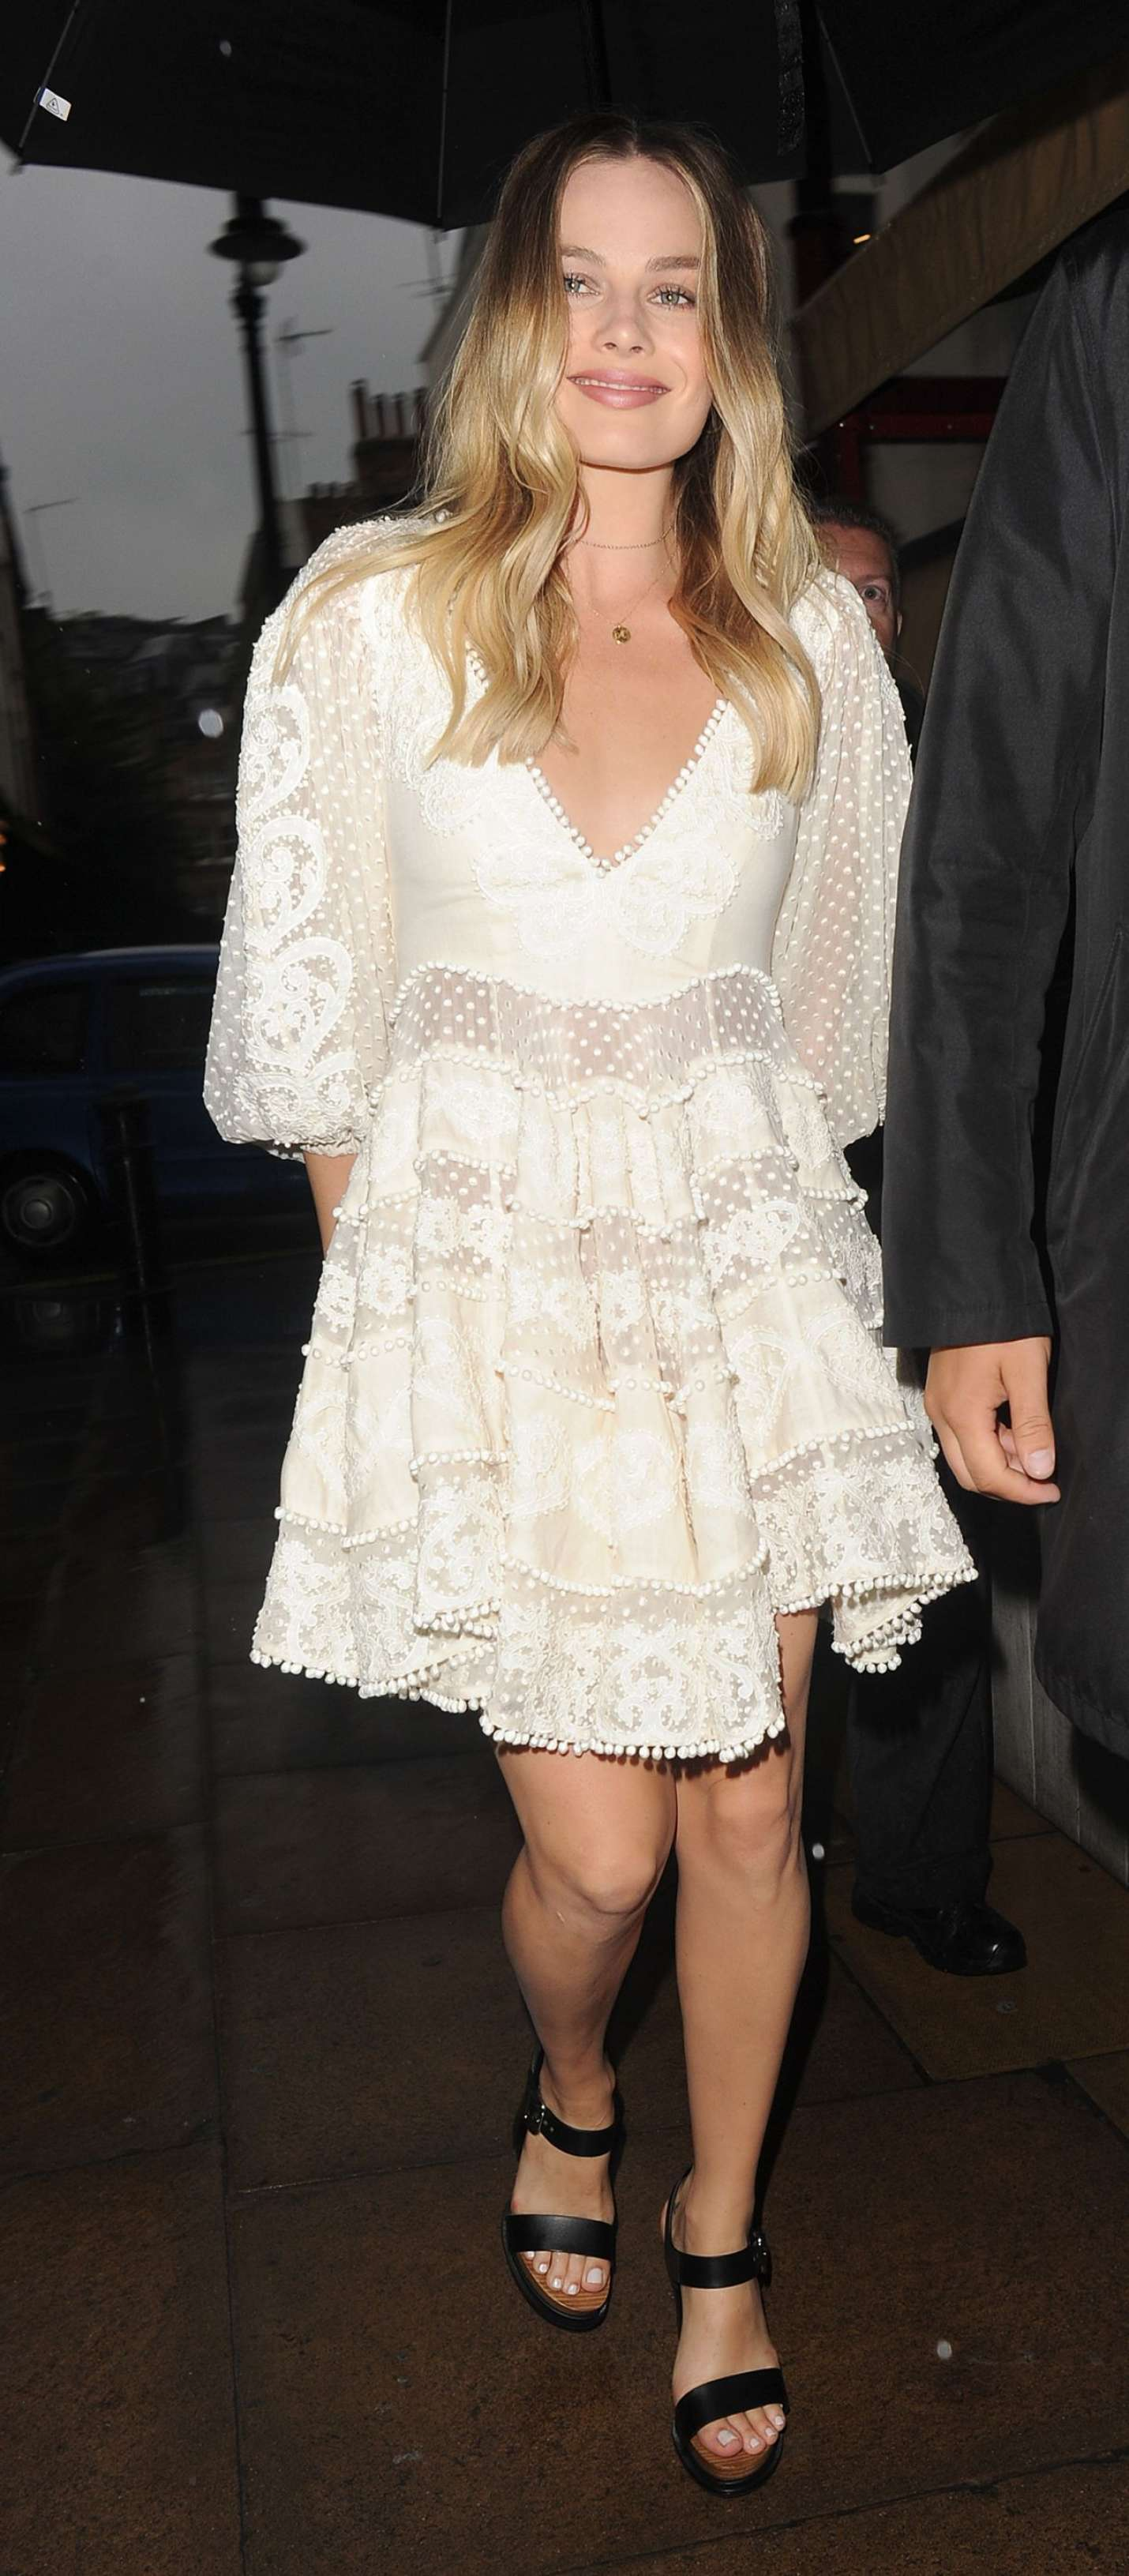 Lizzy milian white dress